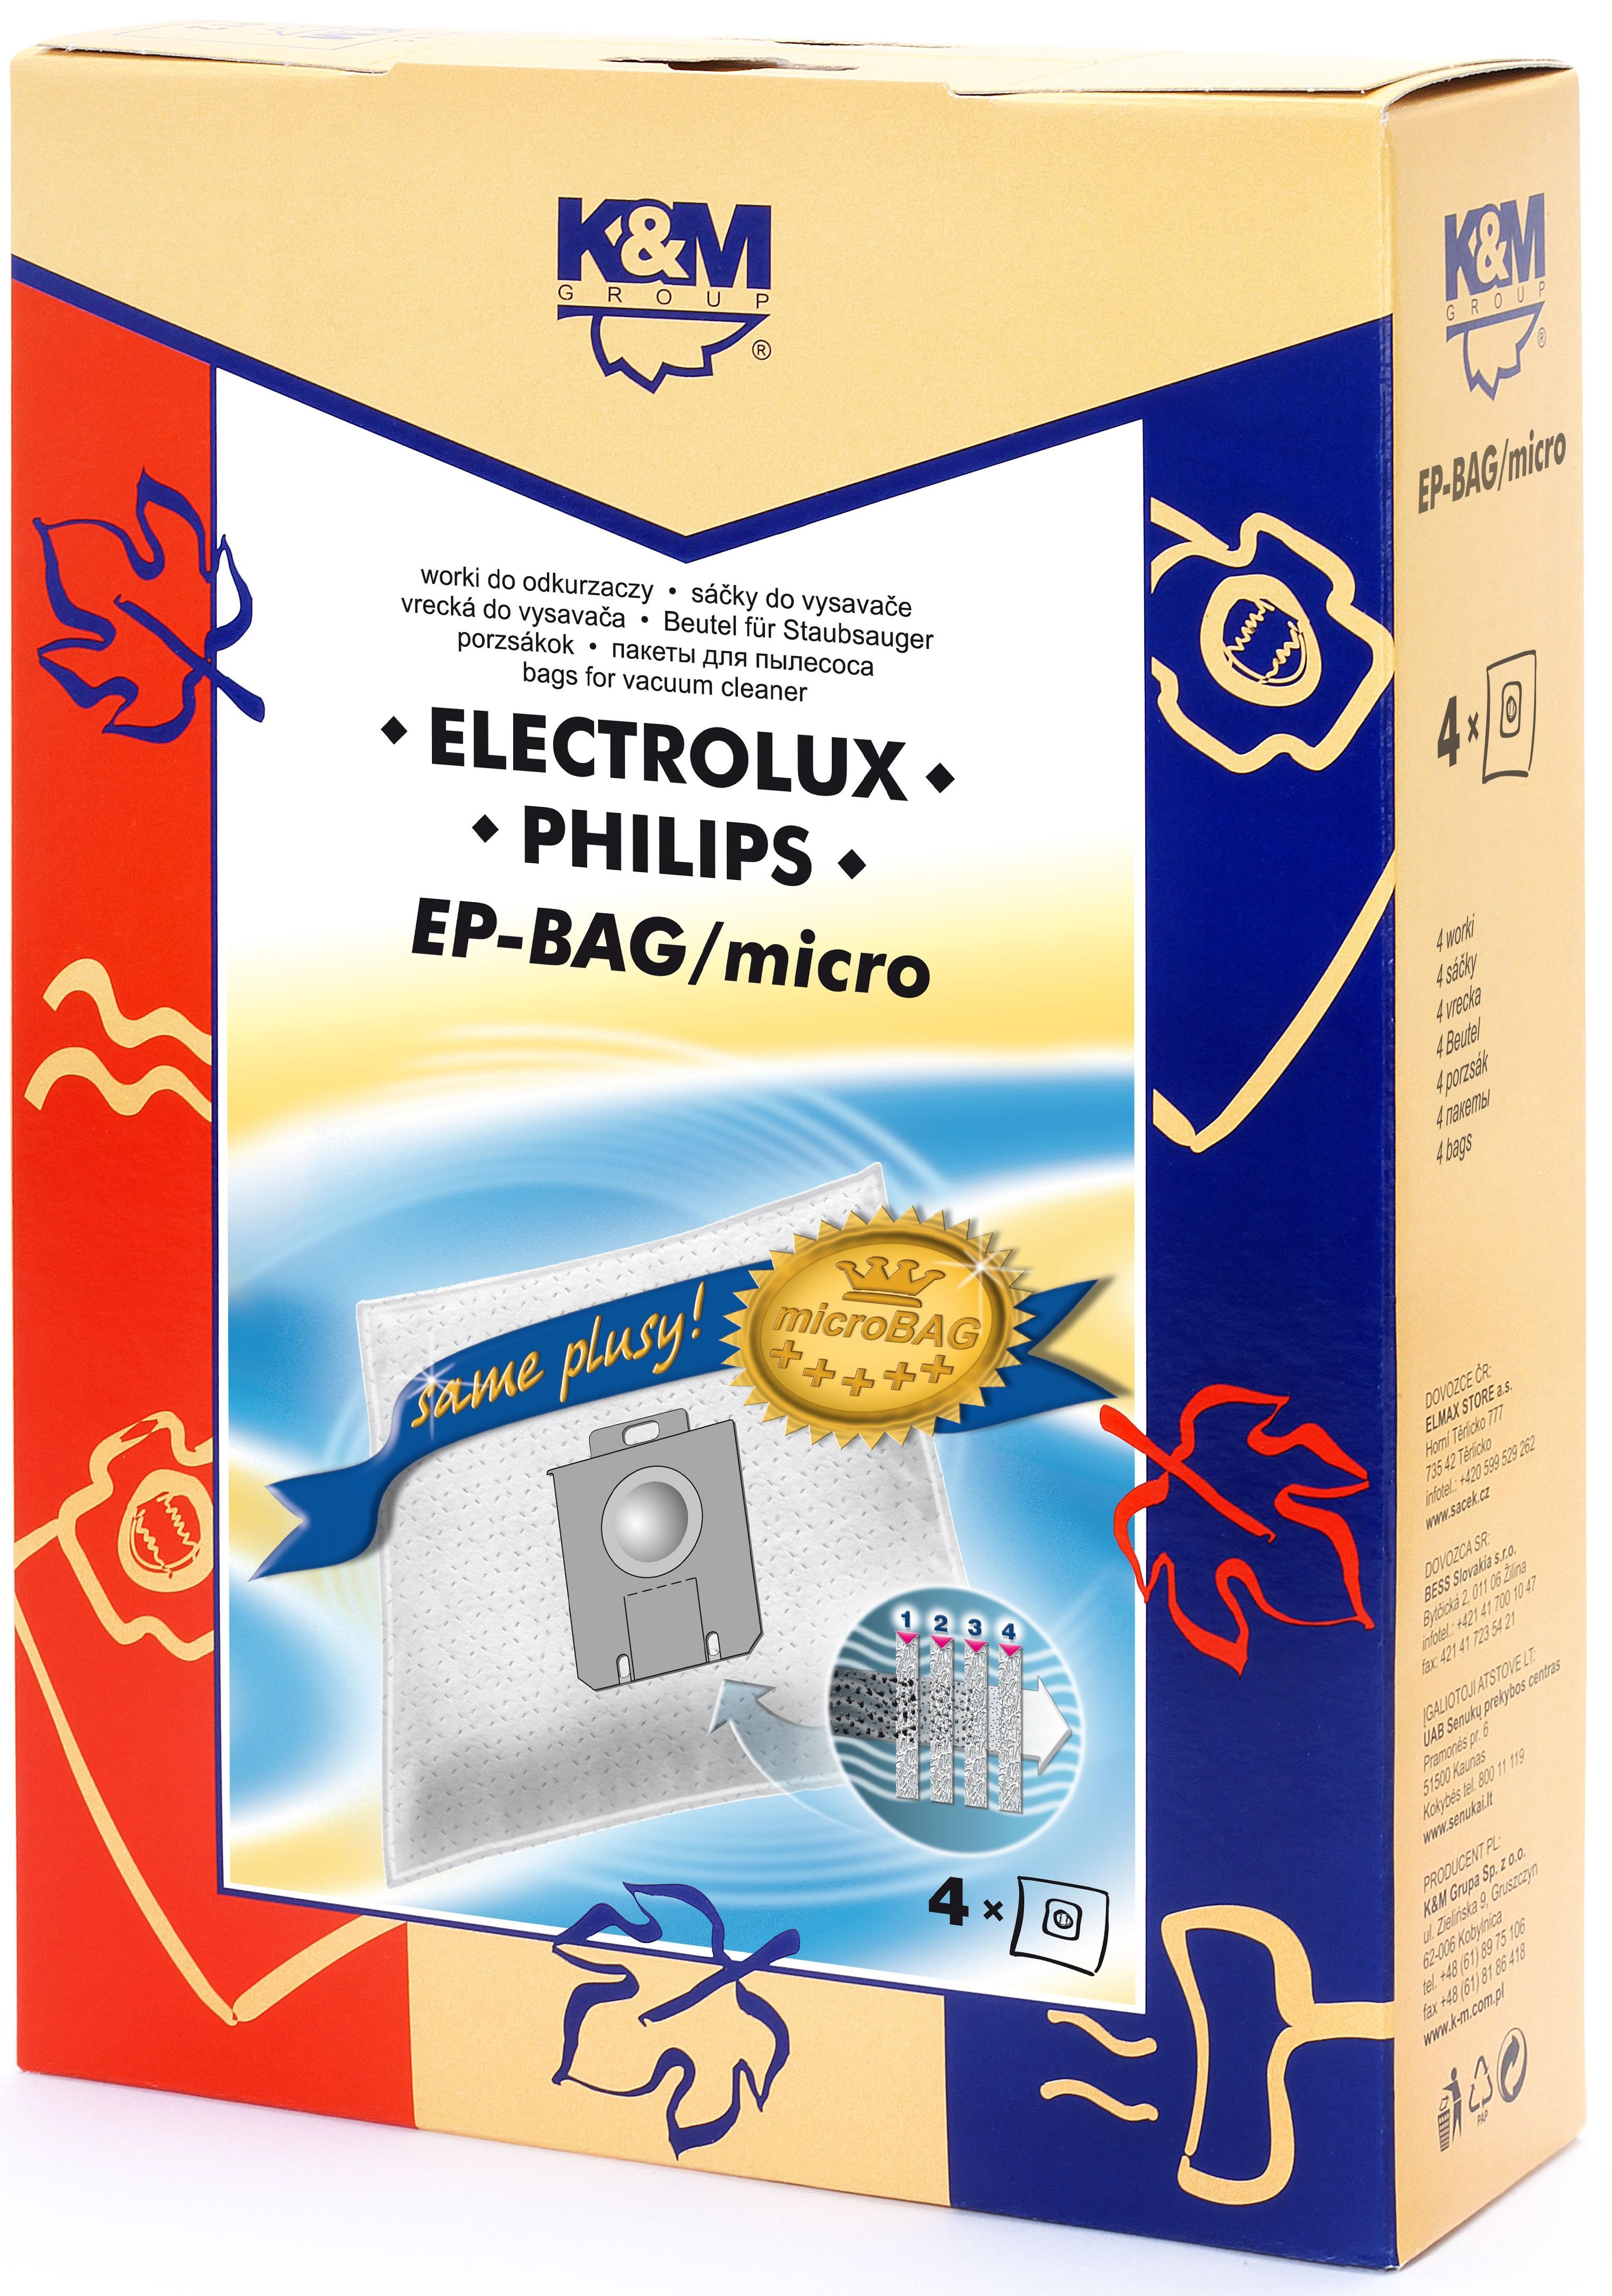 Sac aspirator Electrolux-Philips Universal (S-Bag), sintetic, 4x saci, K&M [0]